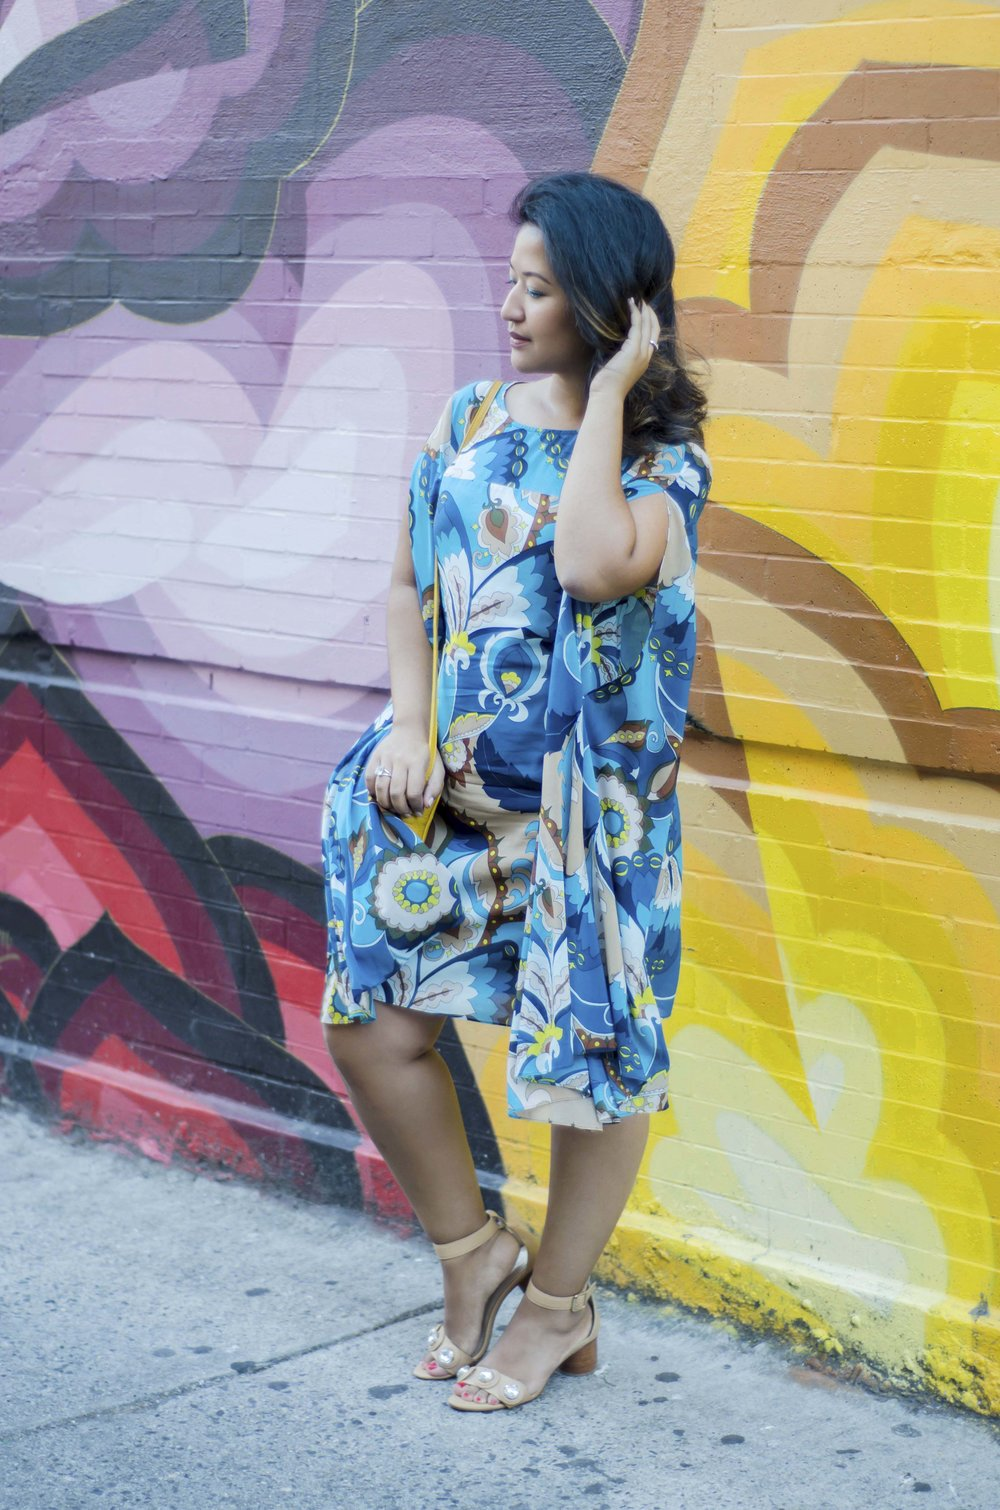 NYFW Trina Turk Dress2.jpg